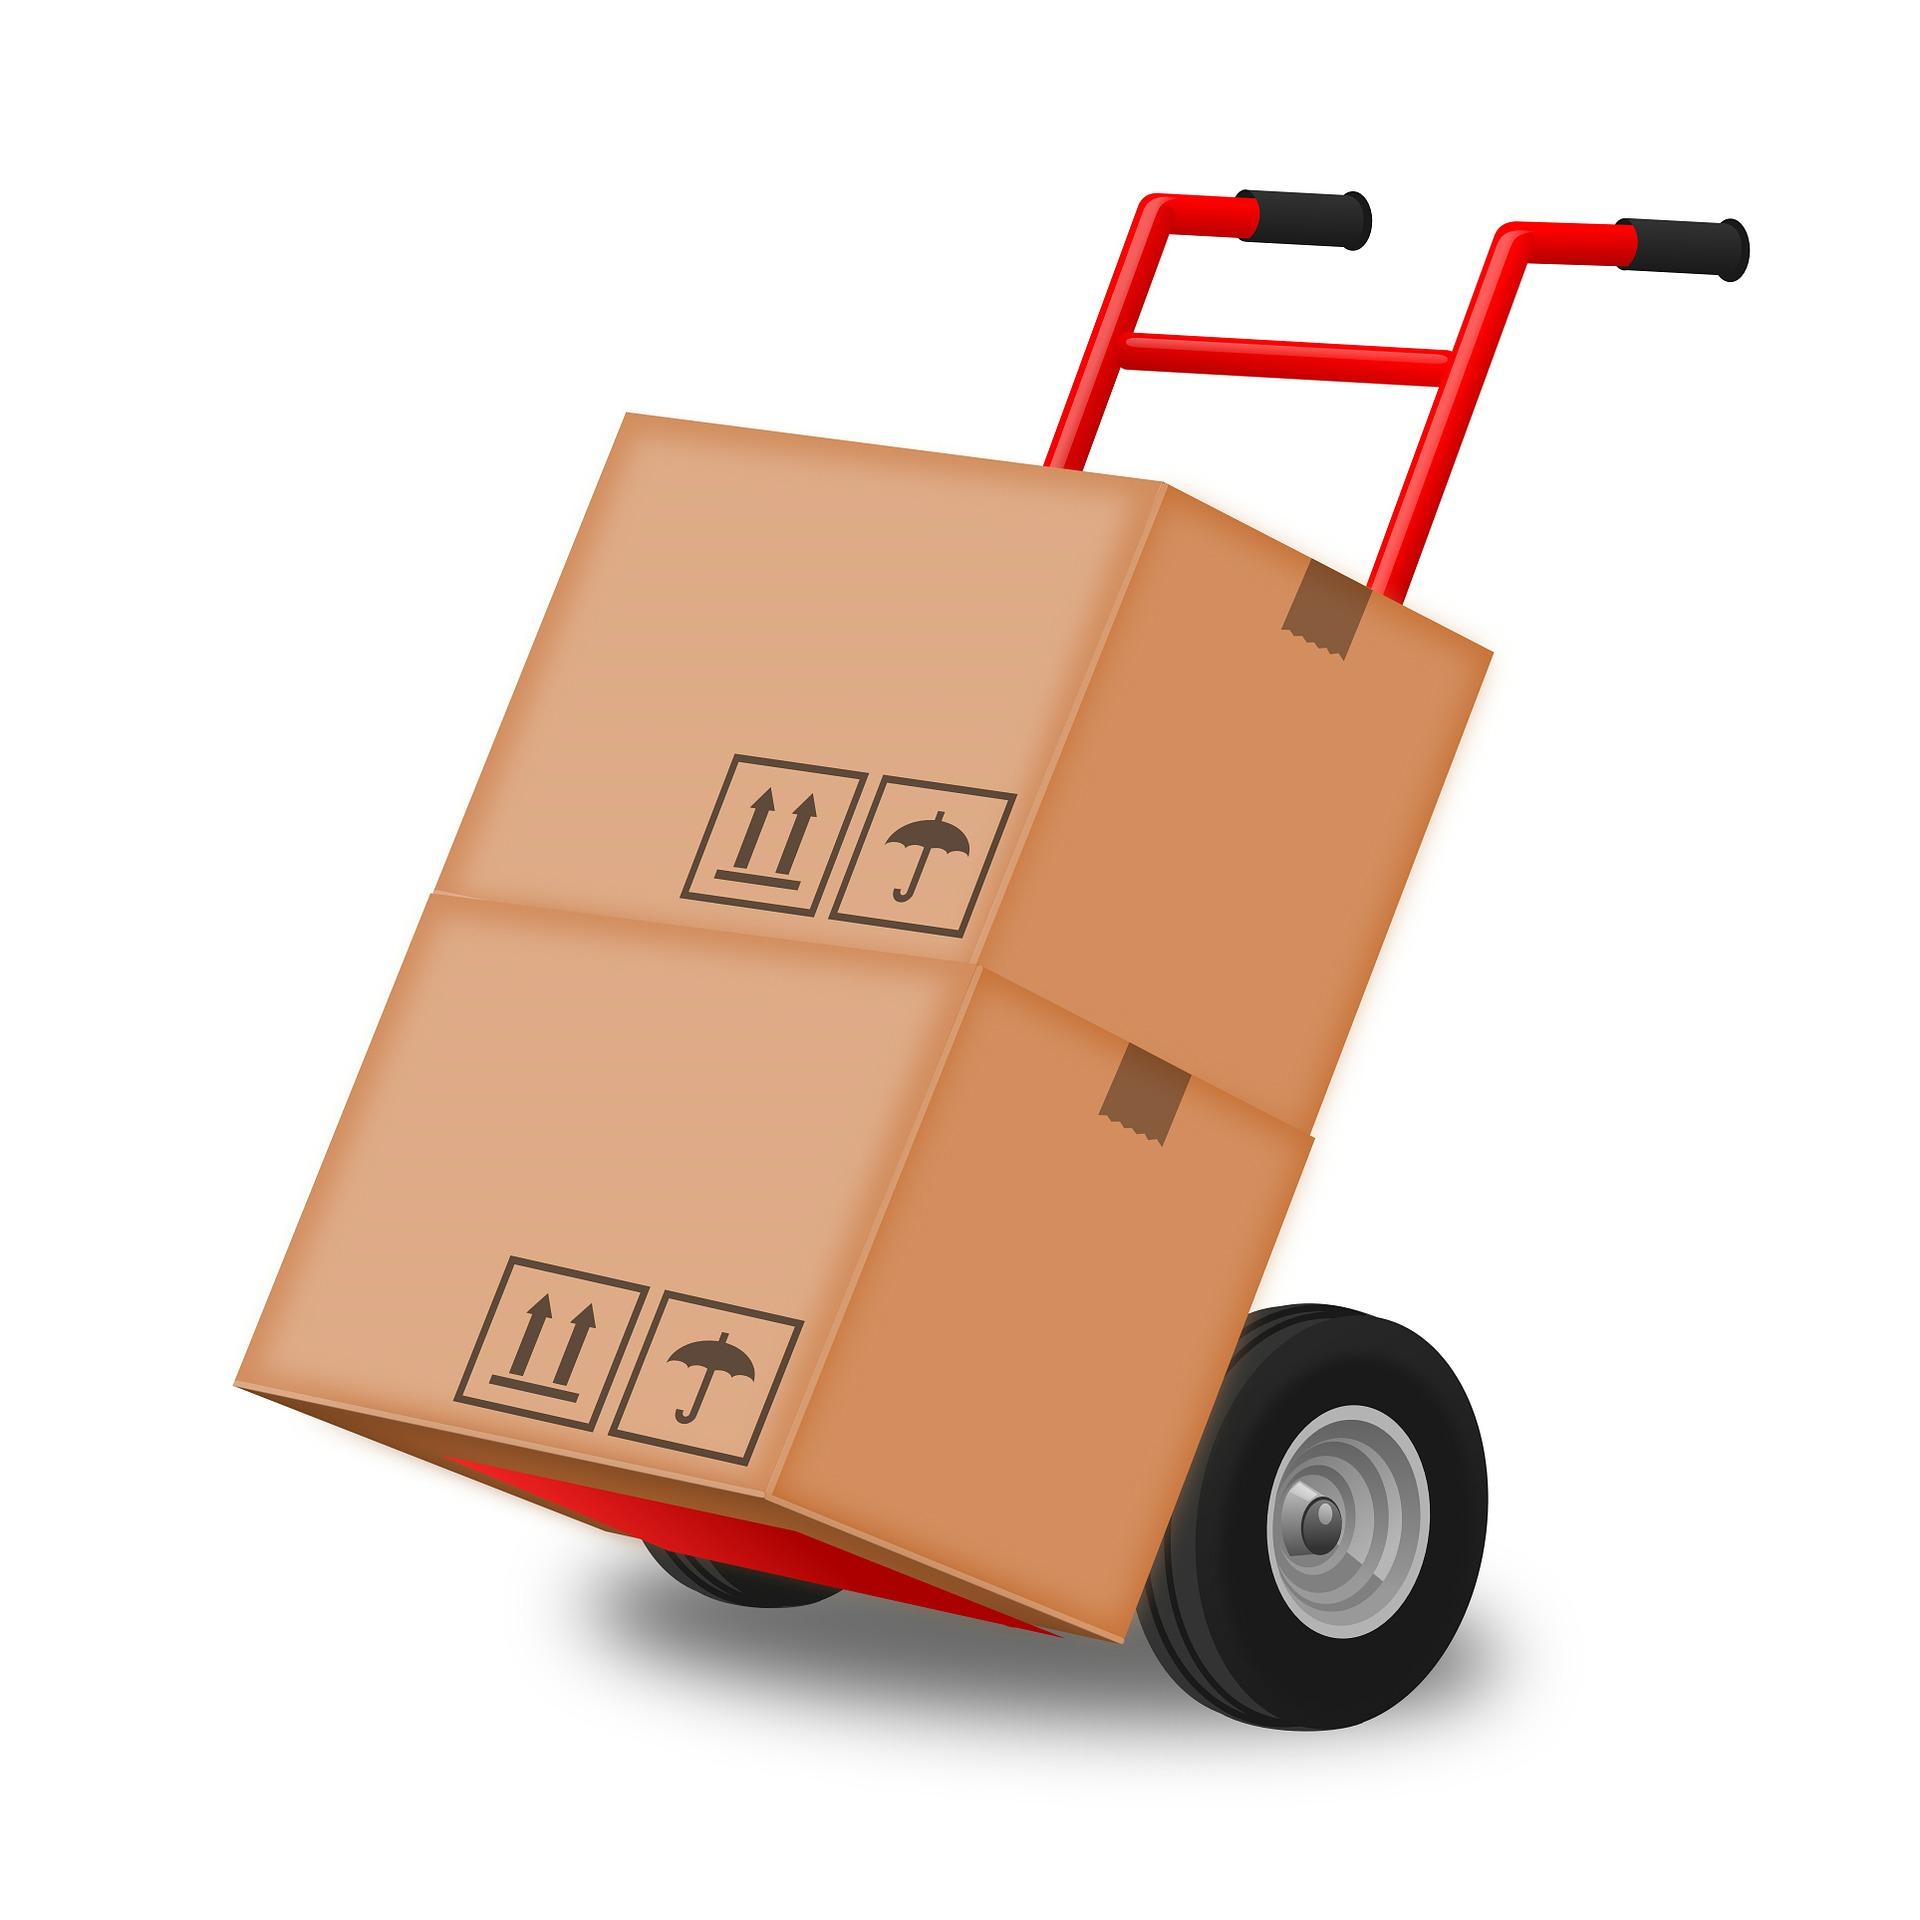 httpclearbox.co.il ריקון דירה תמורת התכולה